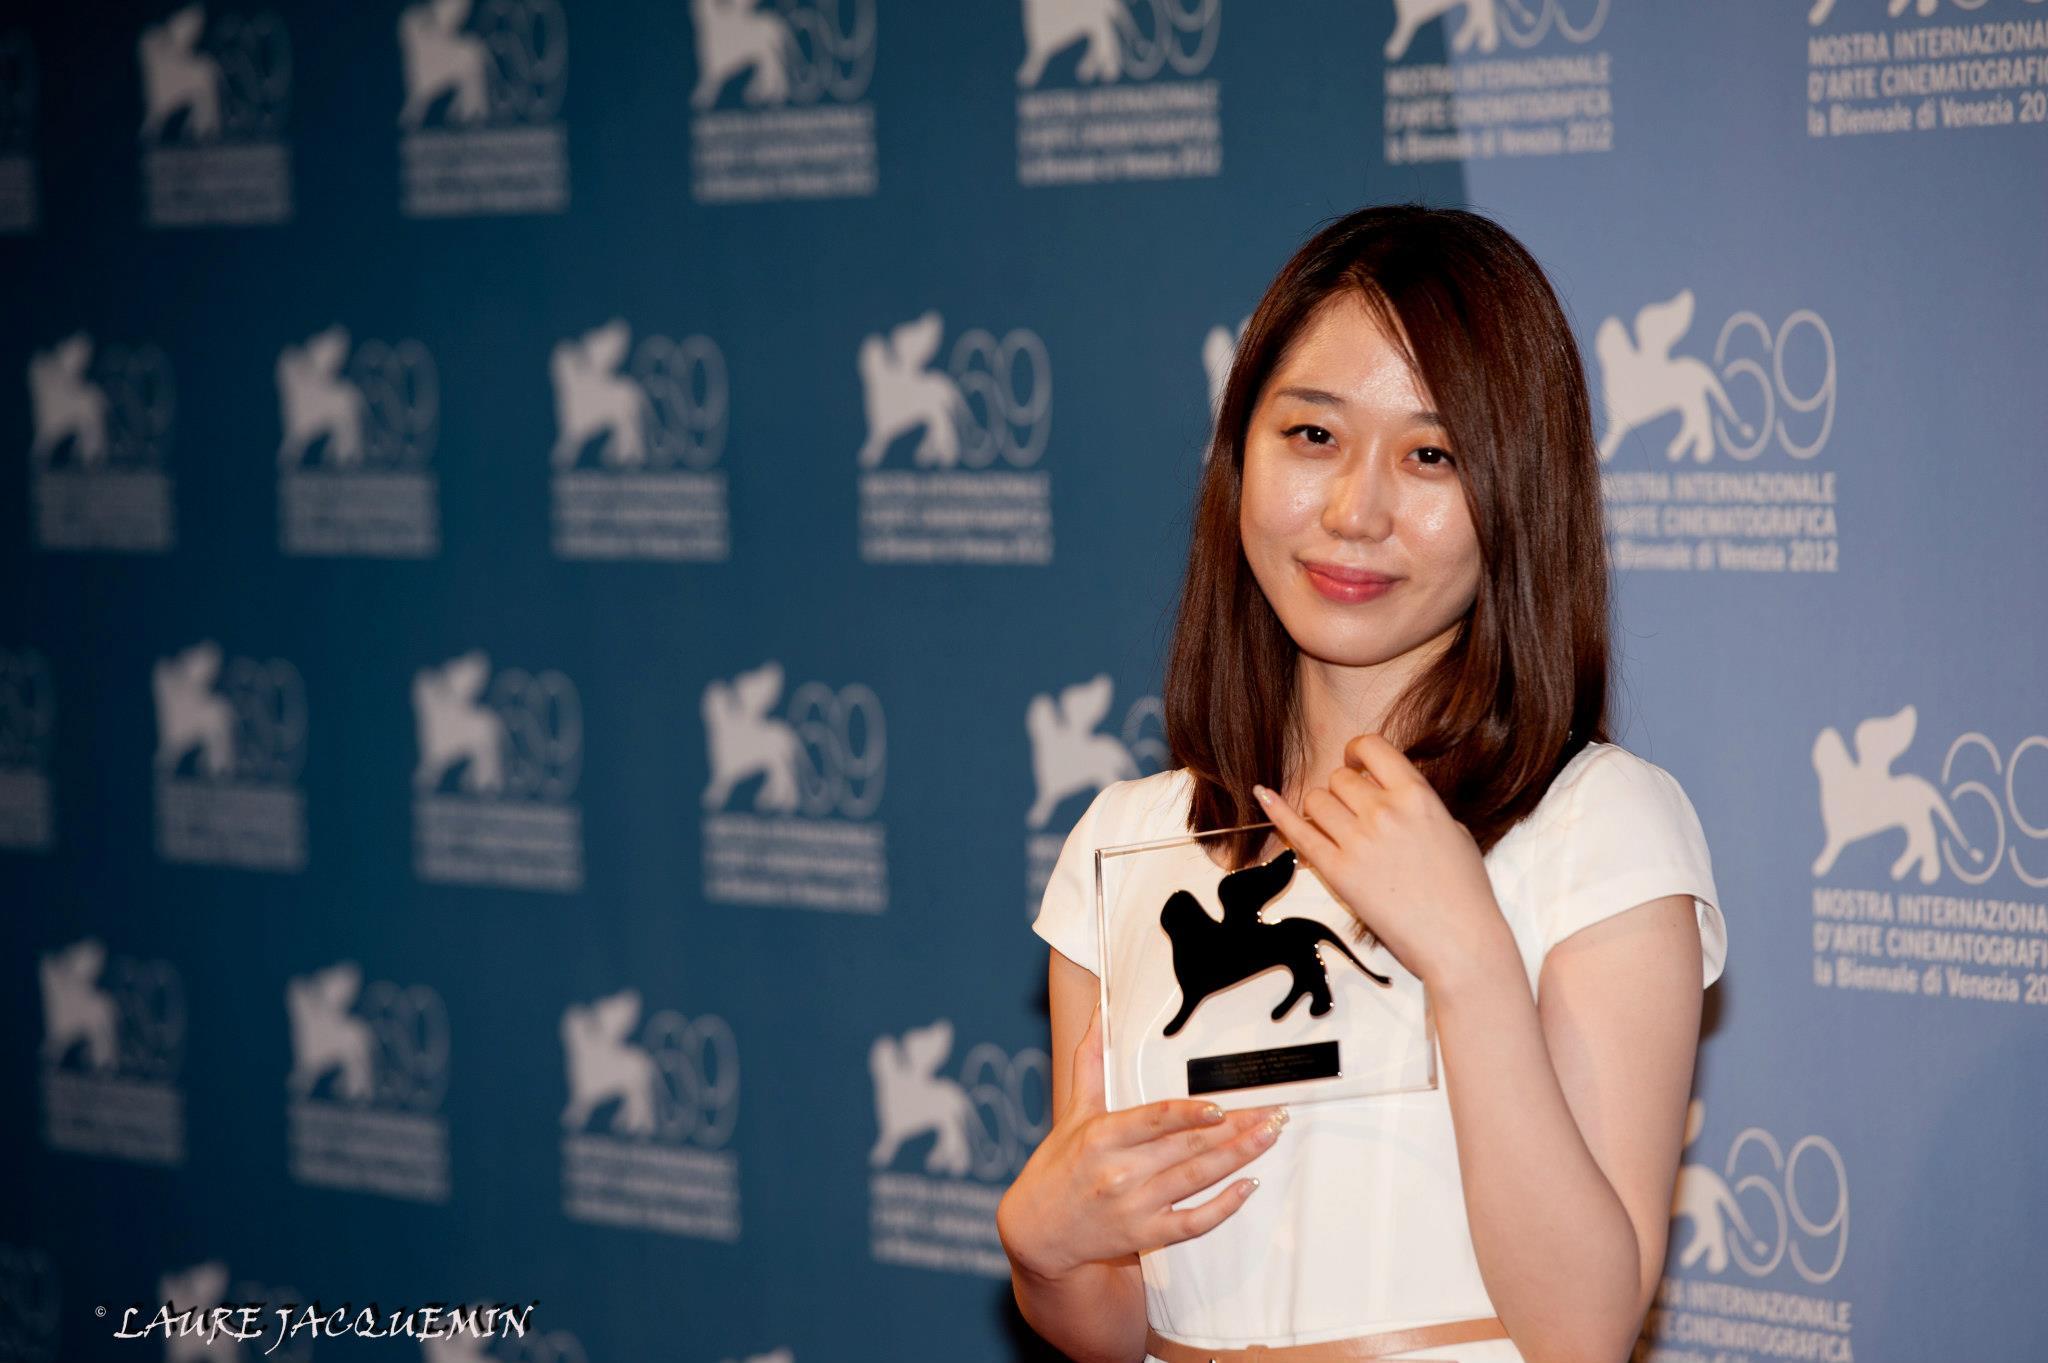 venice film festival venice laure jacquemin (78).jpg